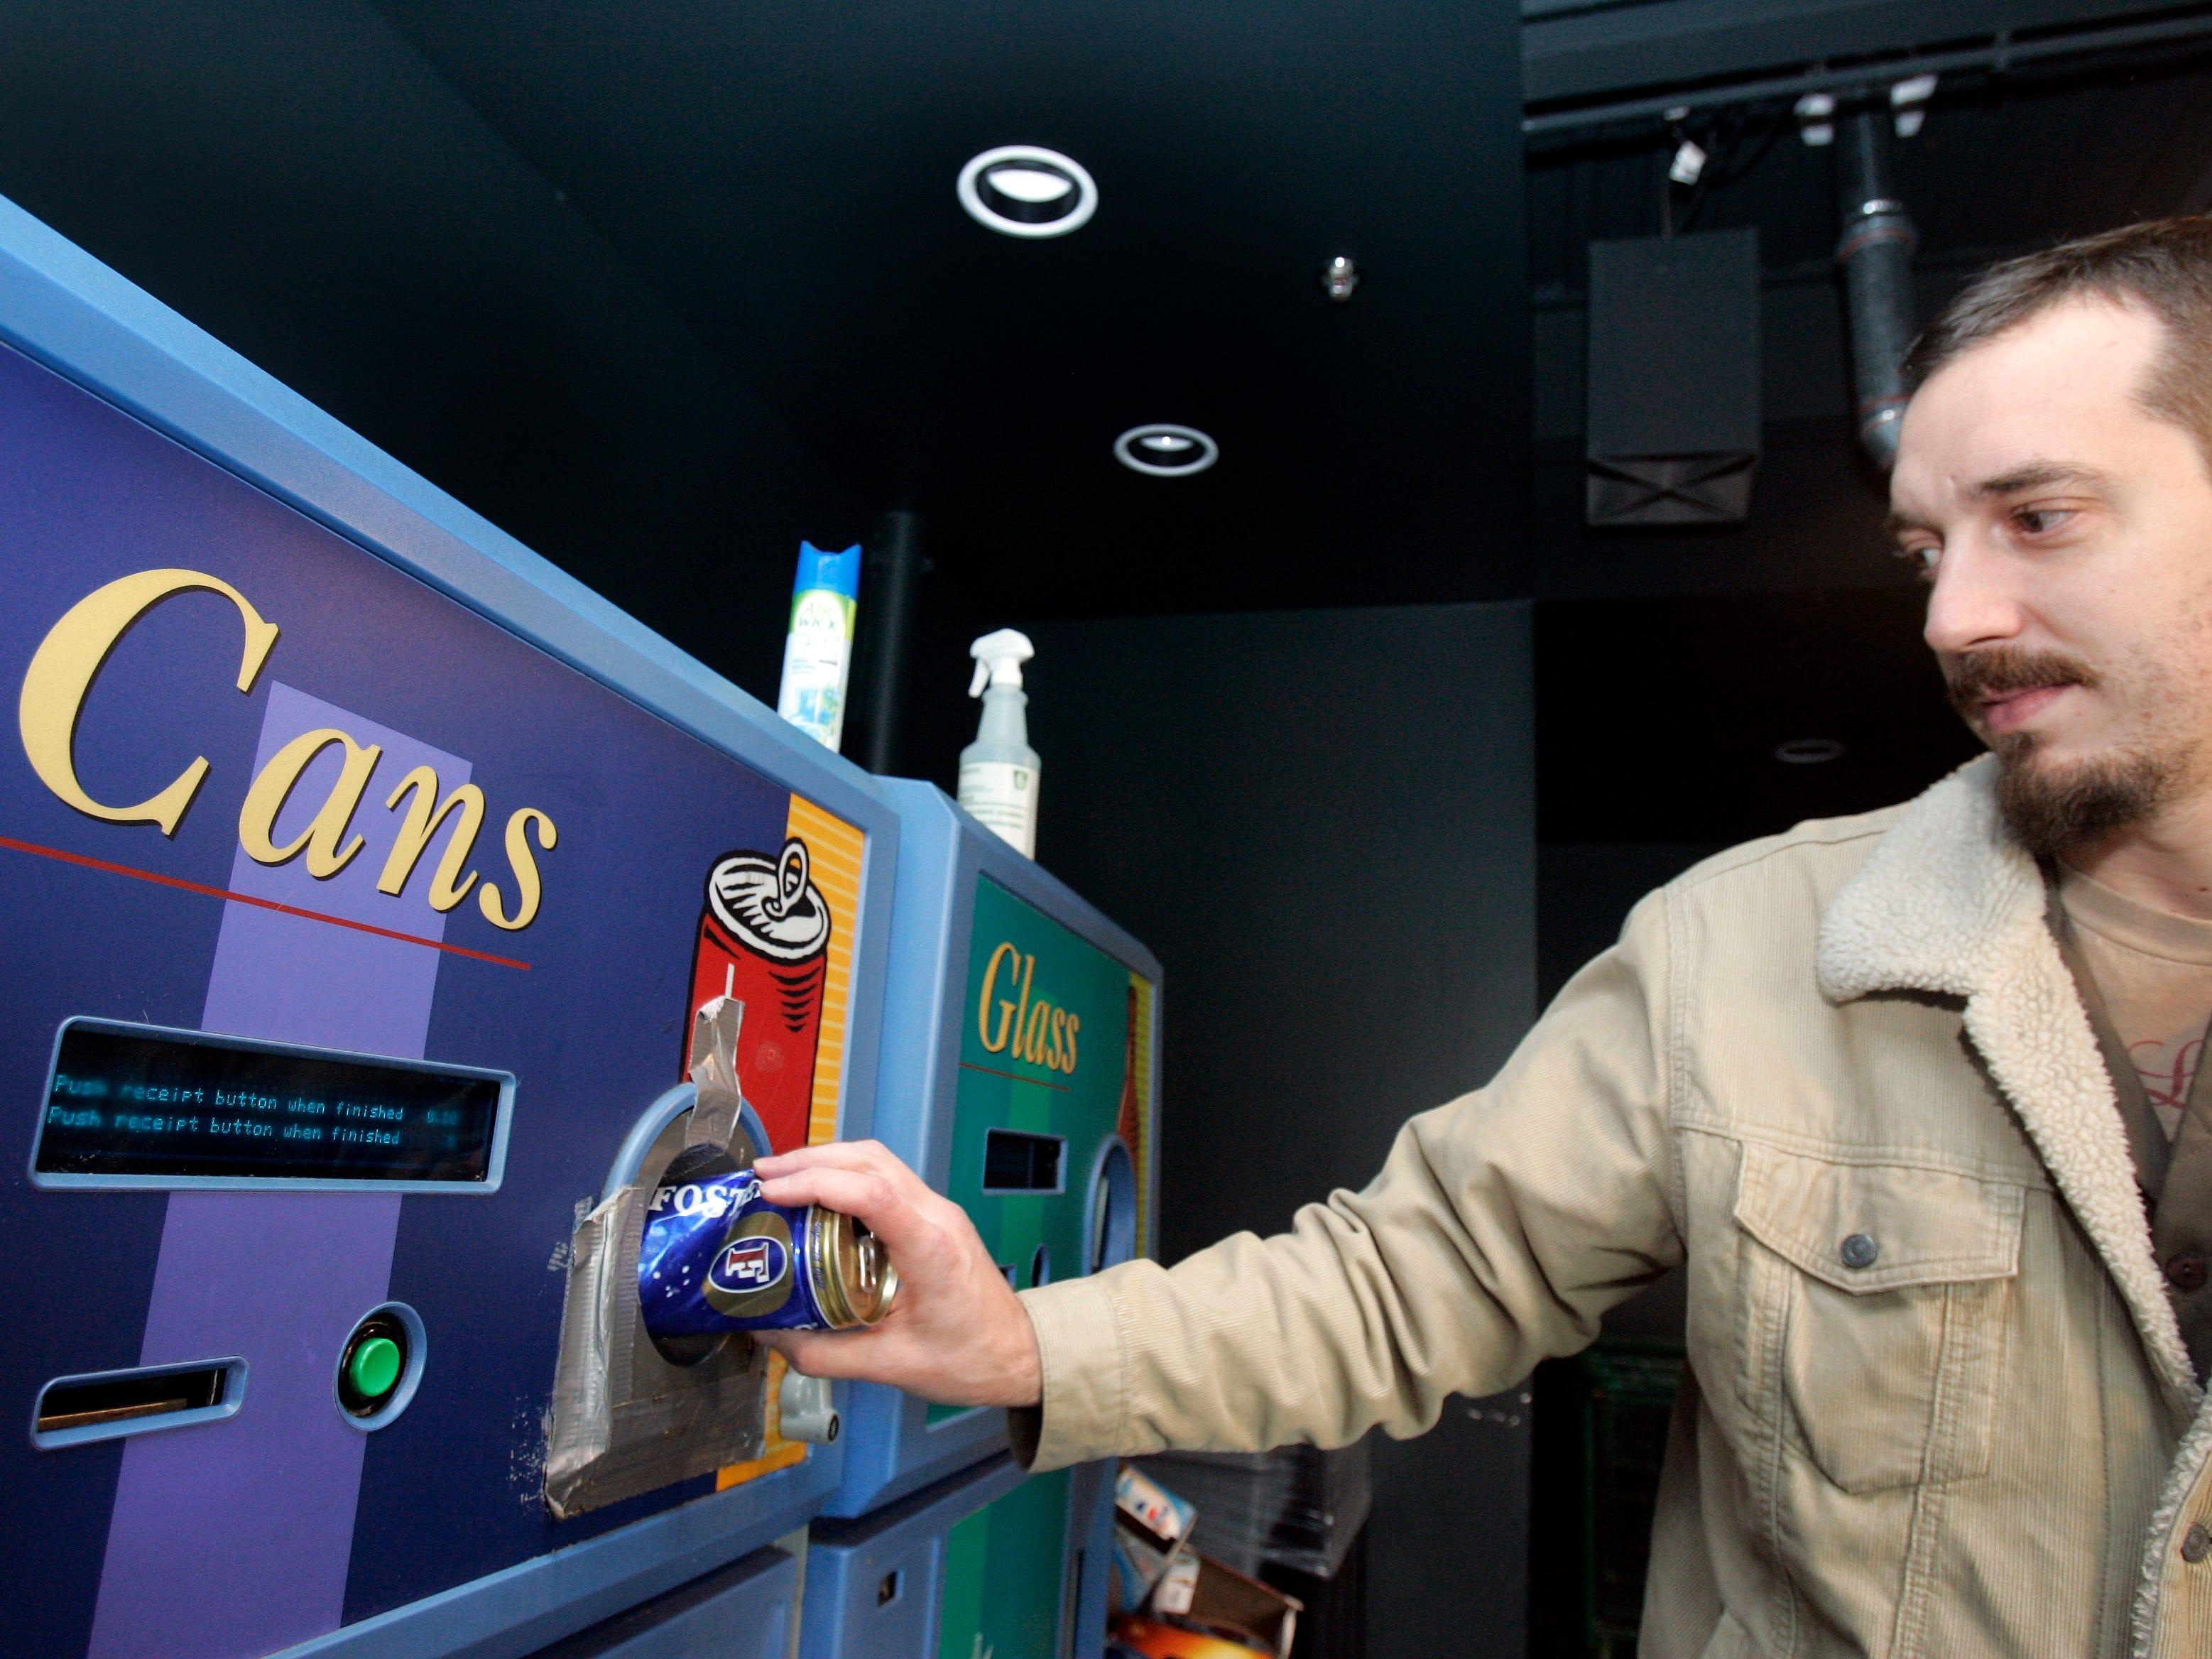 Naida: Deposit law bottles up recycling efforts